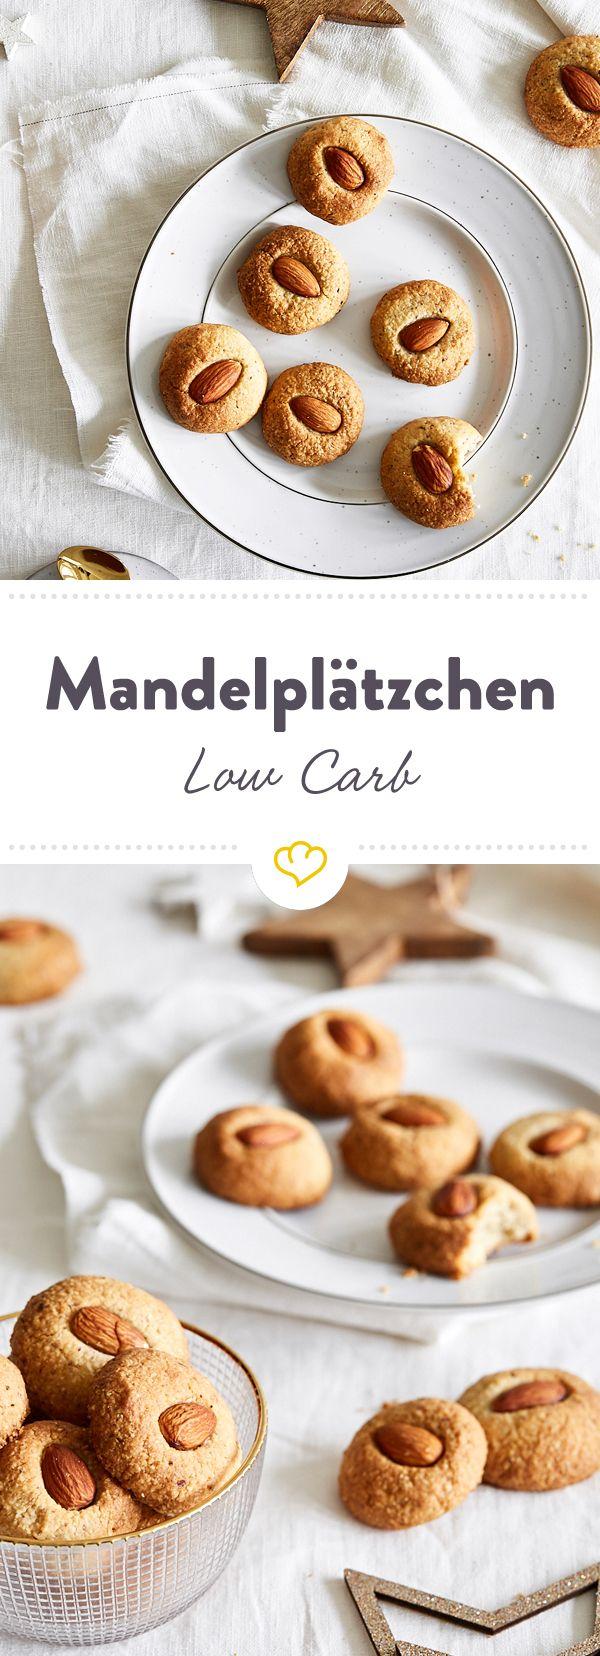 Low Carb Mandelplätzchen #cookiesalad